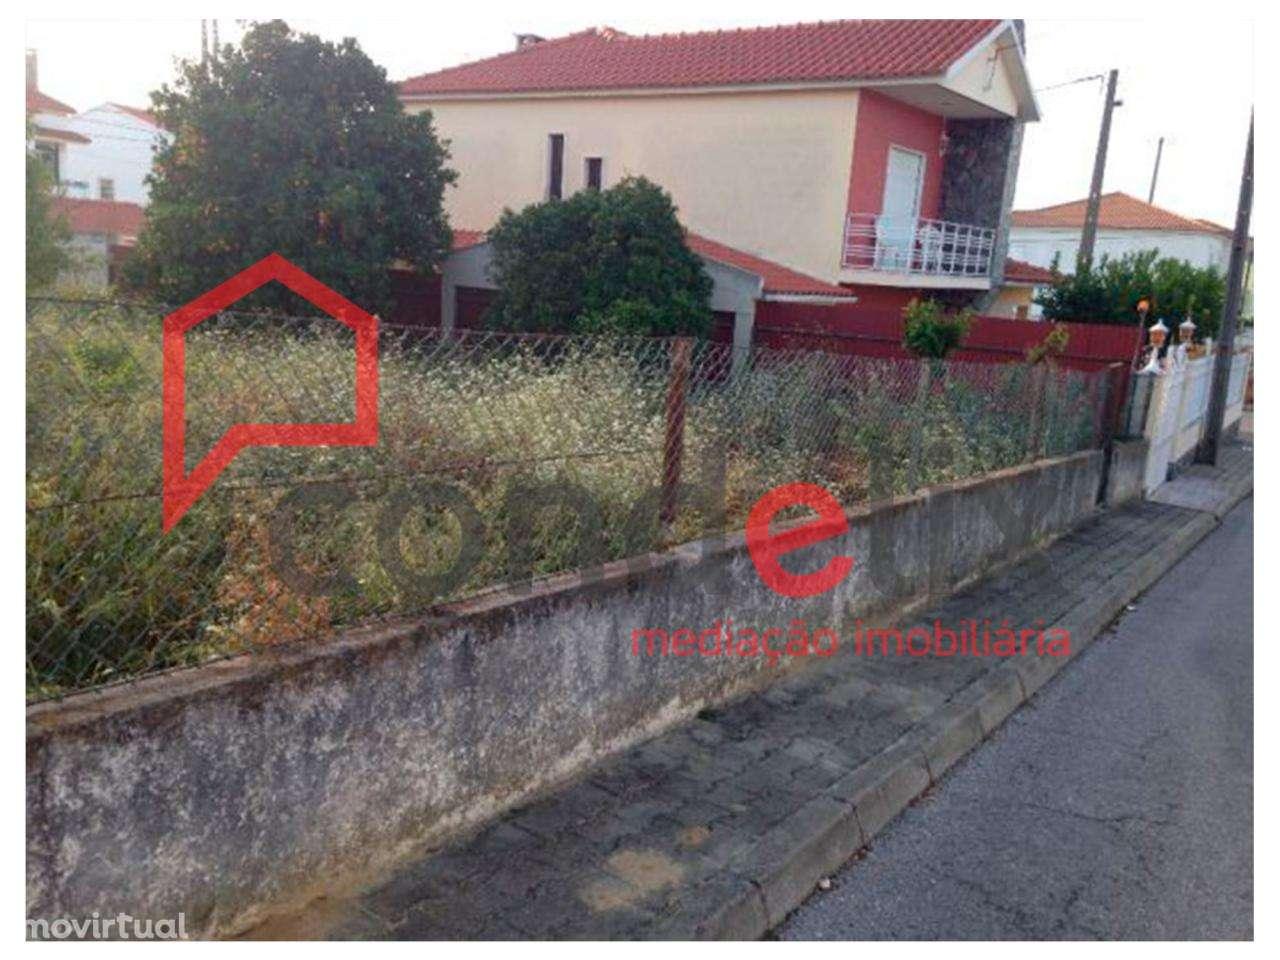 Terreno para comprar, Seixal, Arrentela e Aldeia de Paio Pires, Setúbal - Foto 1